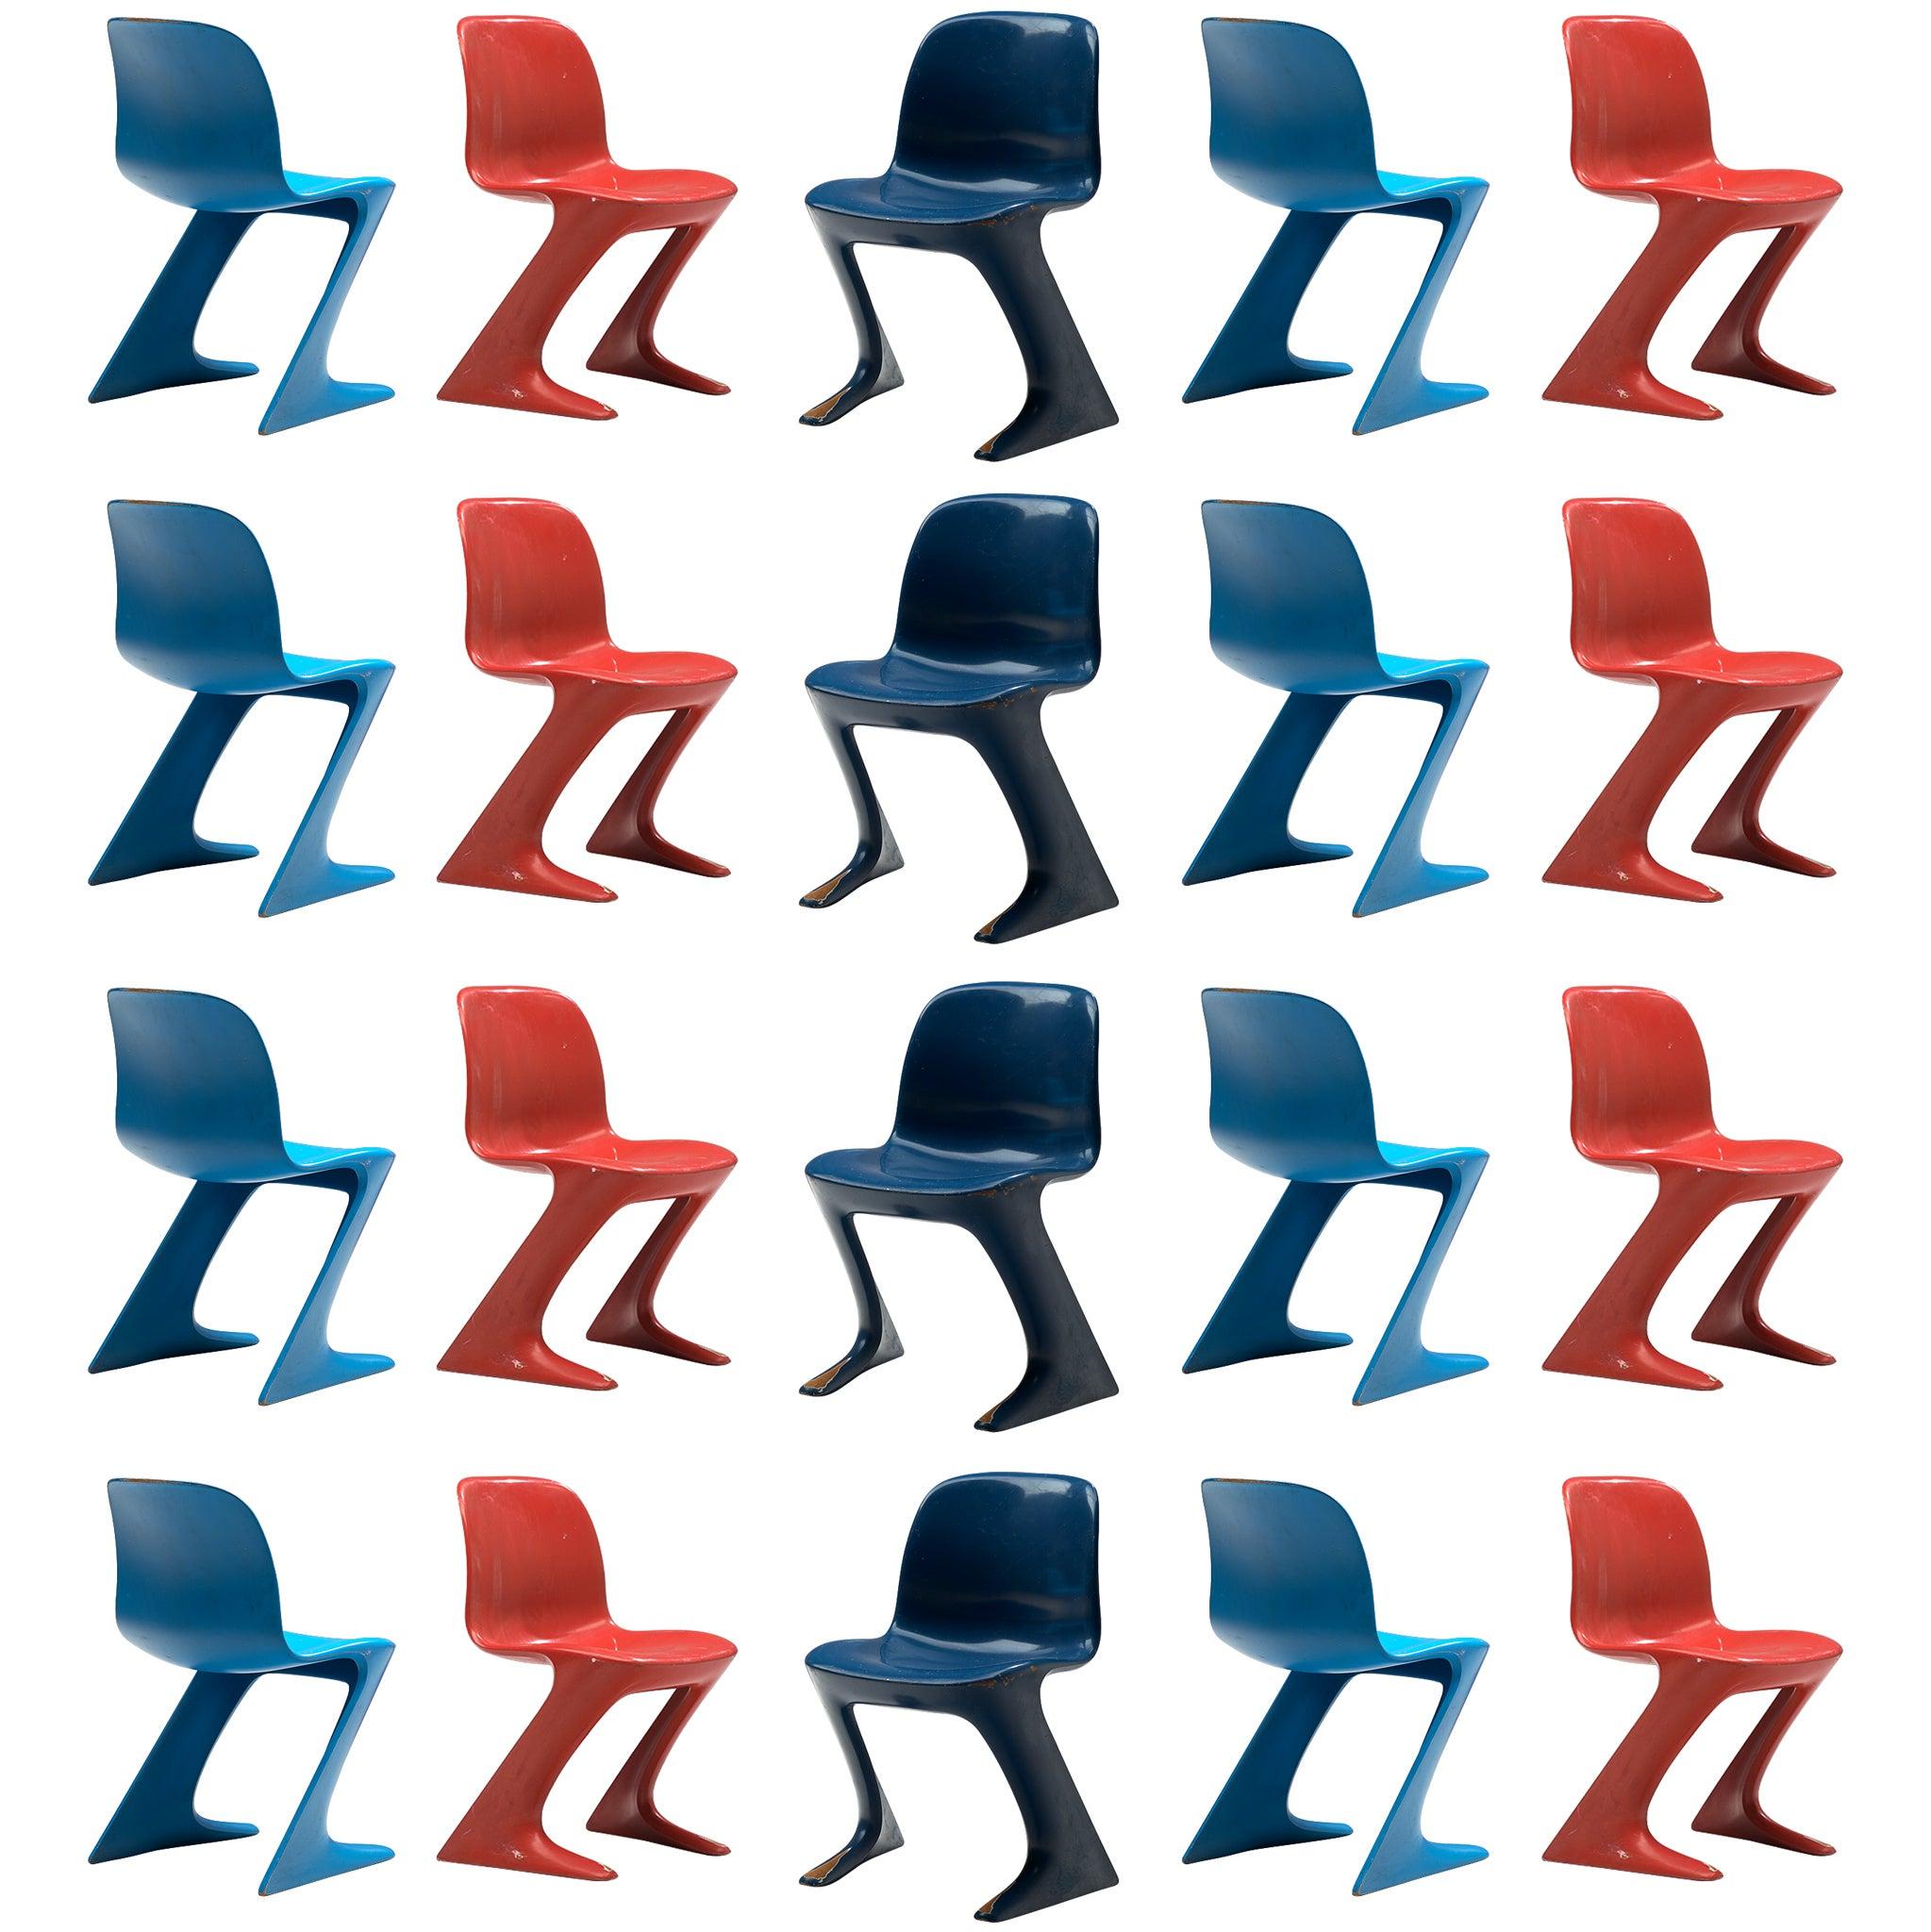 Ernst Moeckl Large Set of Multicolored Kangaroo Chairs + 50